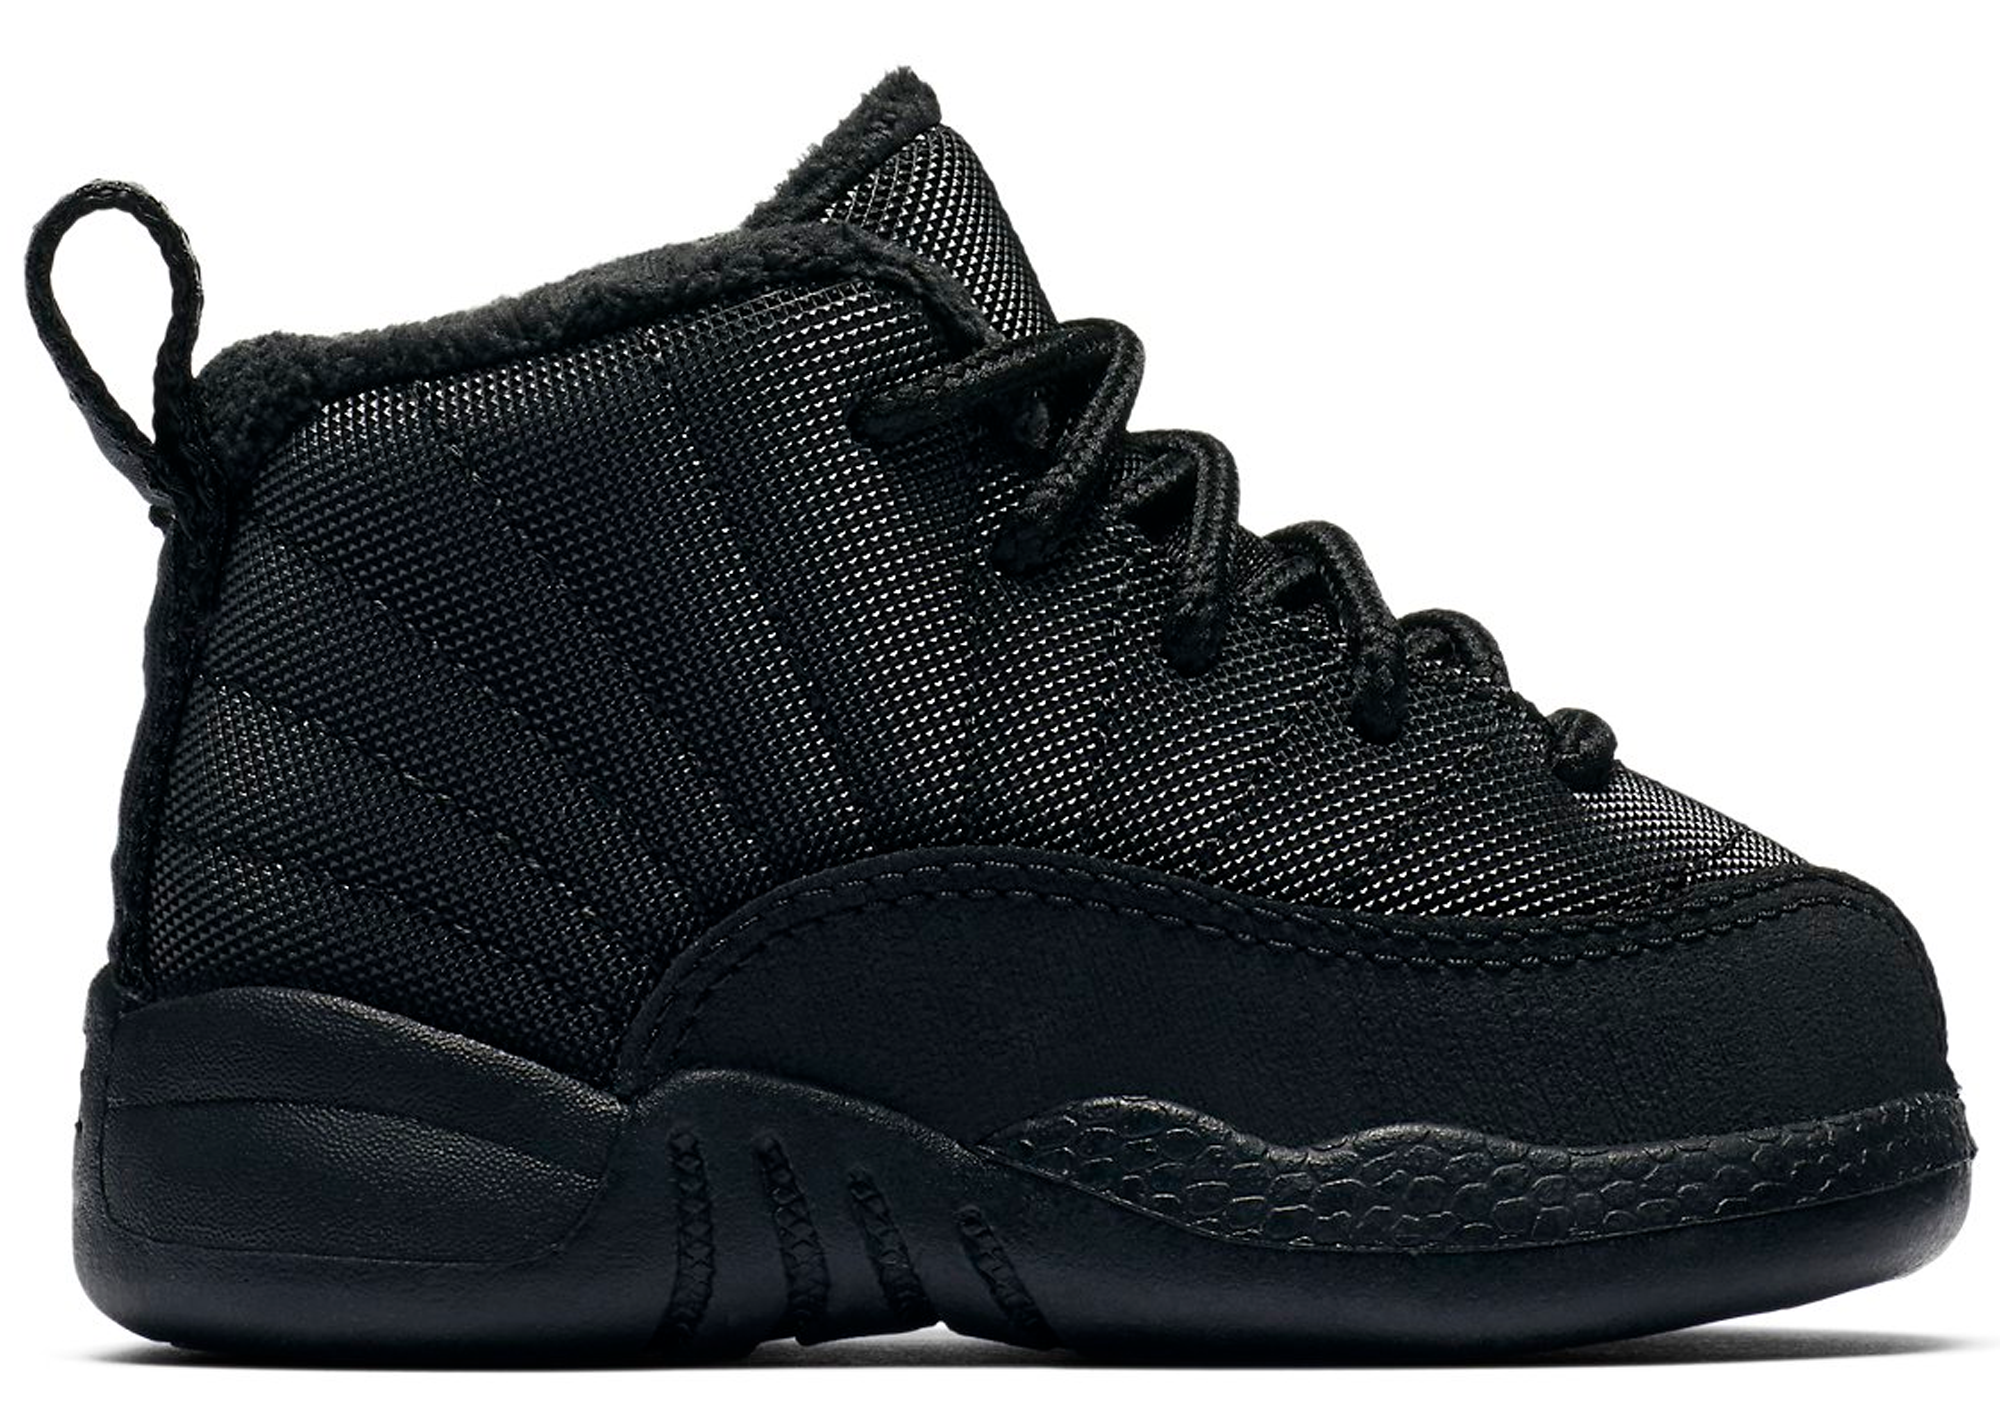 jordan 12 retro all black